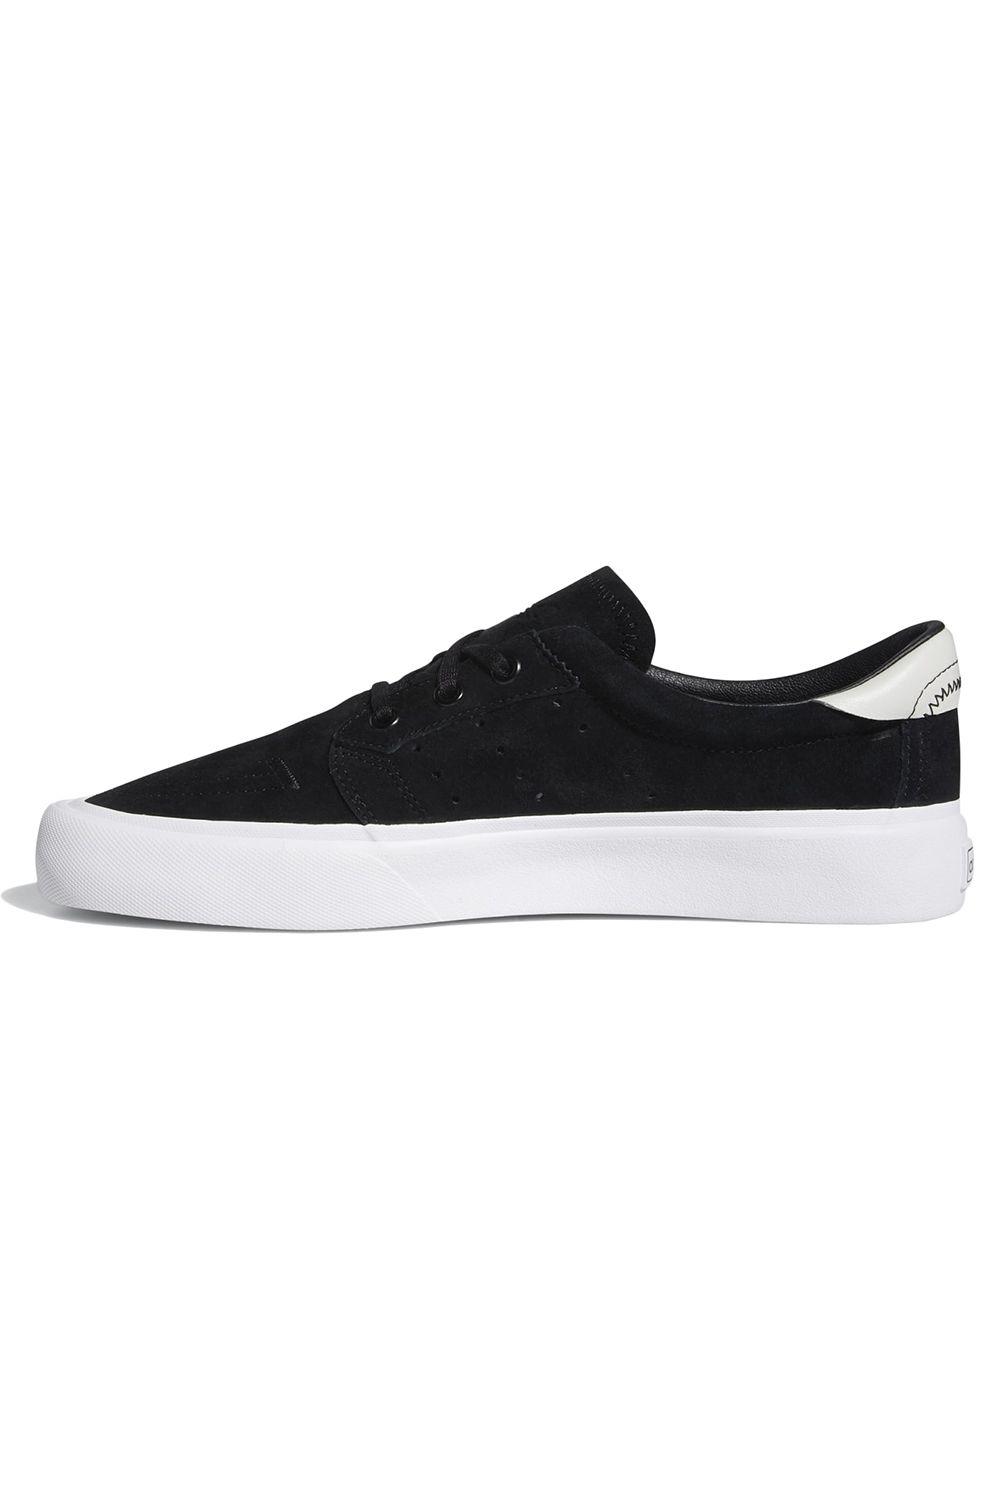 Tenis Adidas CORONADO Core Black/Core Black/Ftwr White